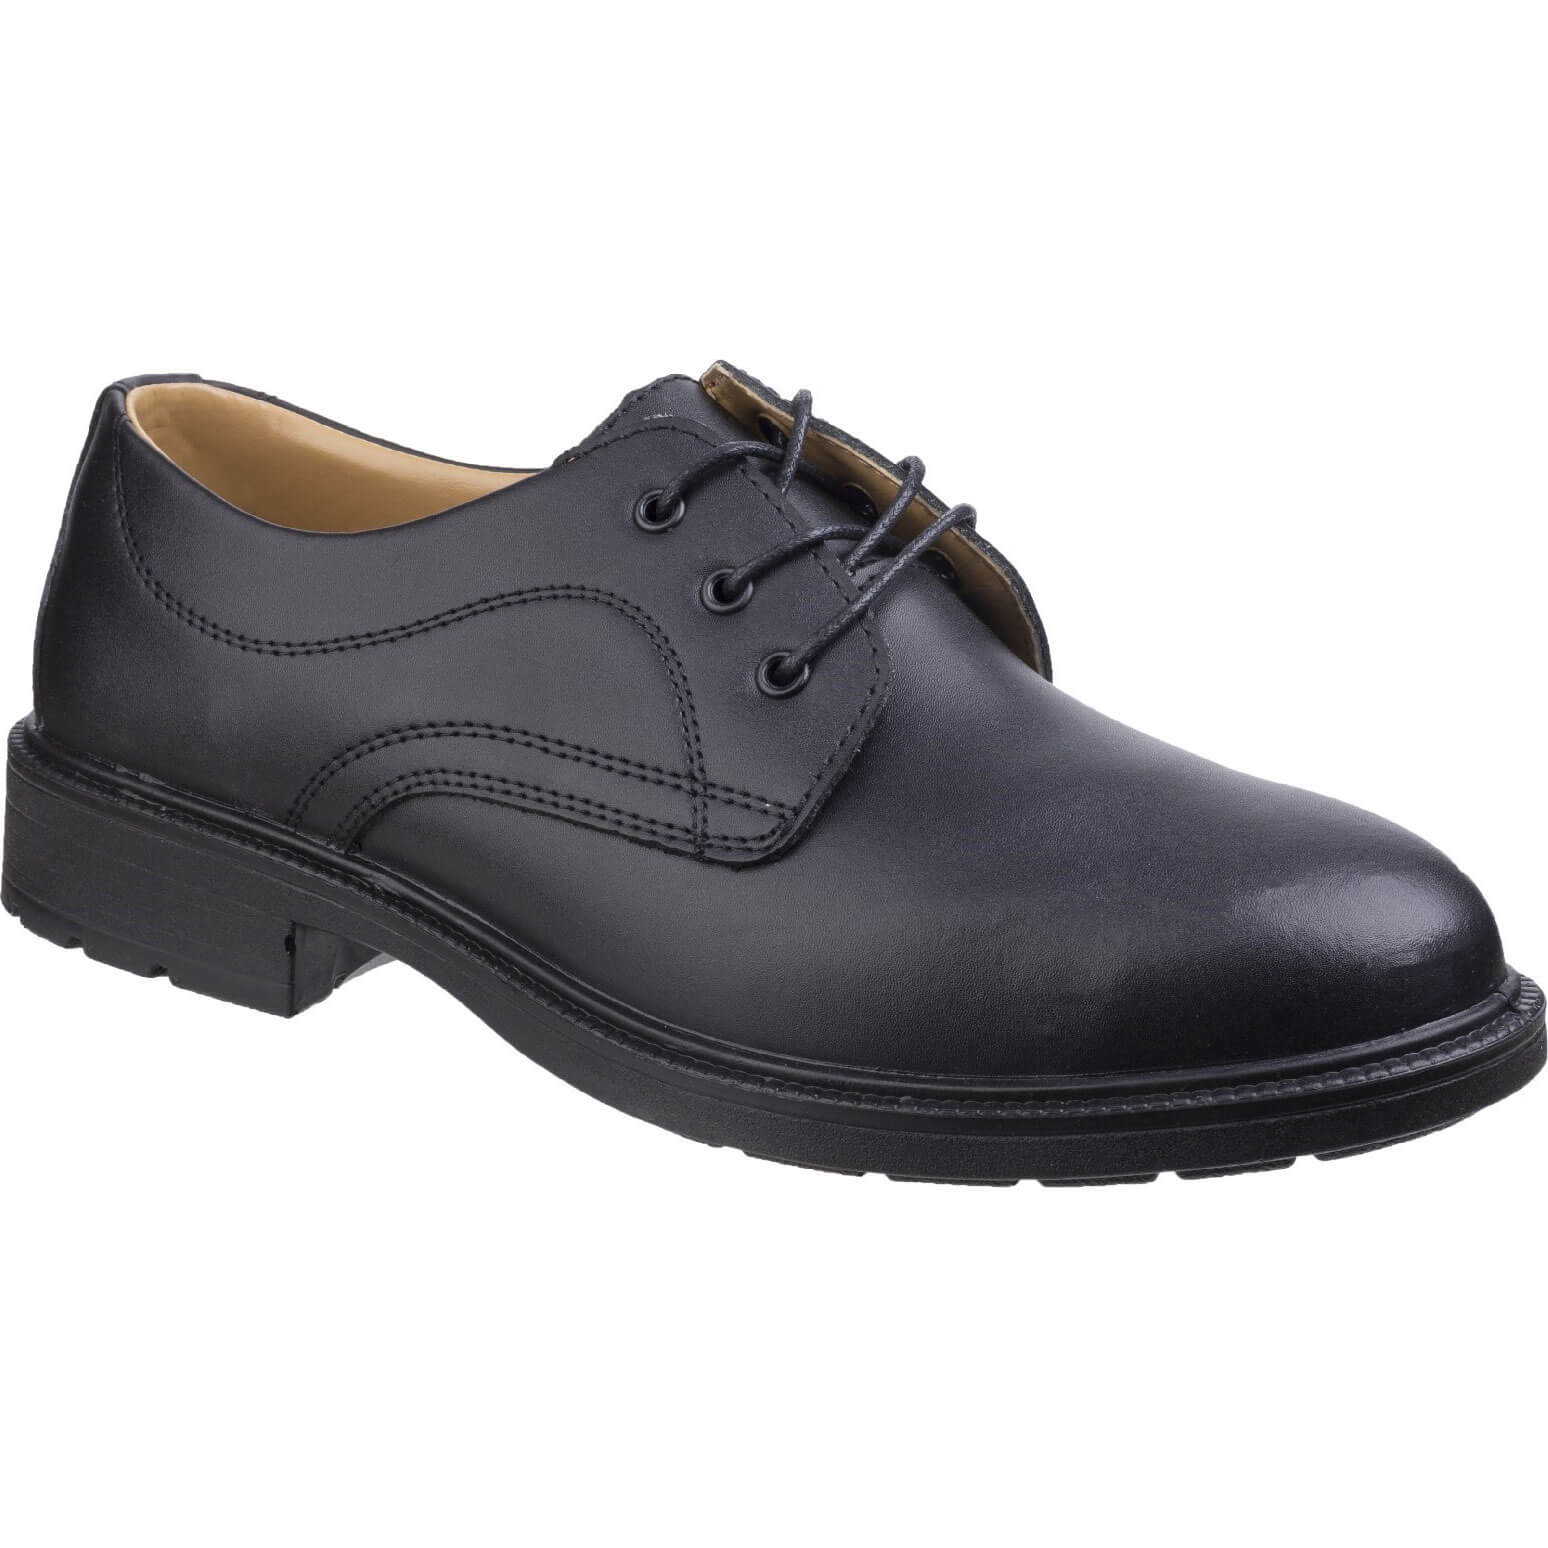 CHEAP Amblers Safety FS45 Safety Shoe Black Size 8 – Men's Footwear